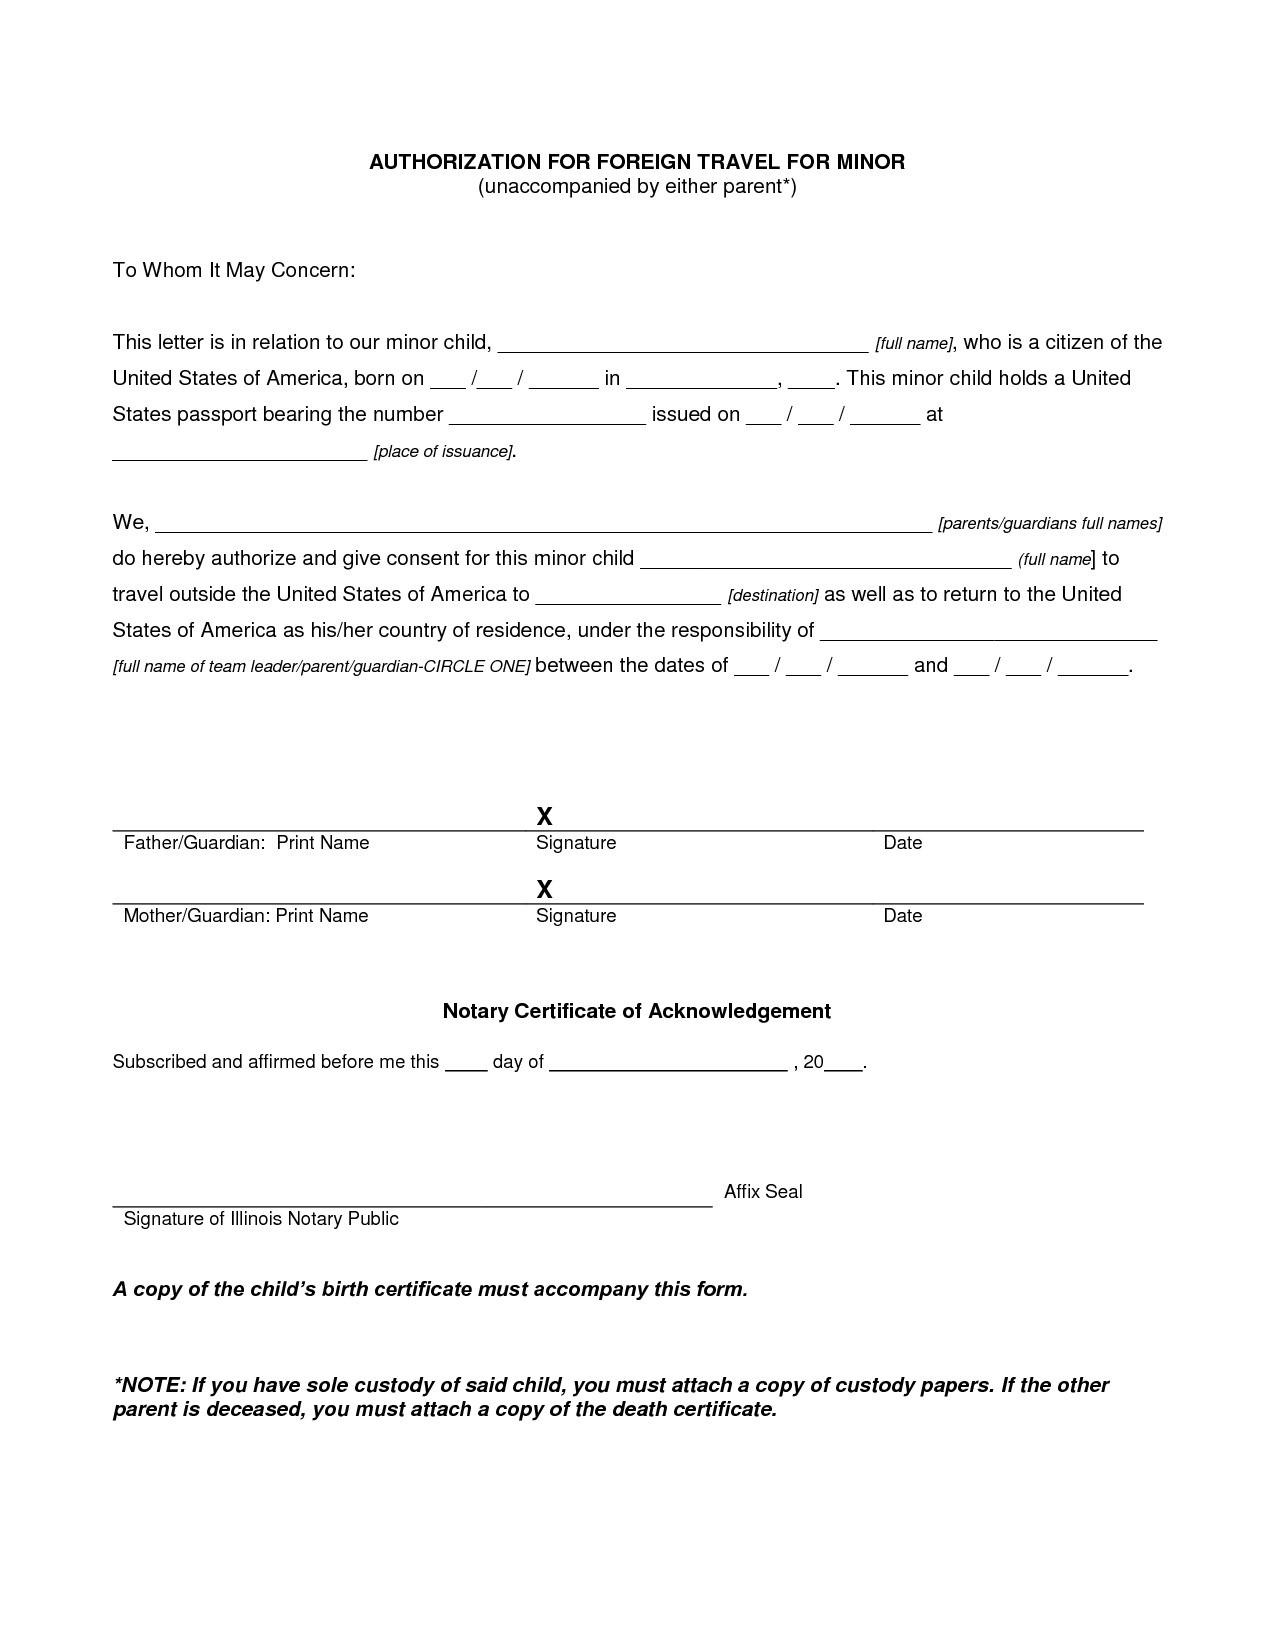 Parent Permission Letter Template - Consent Letter format New Sample Consent Letter for Children